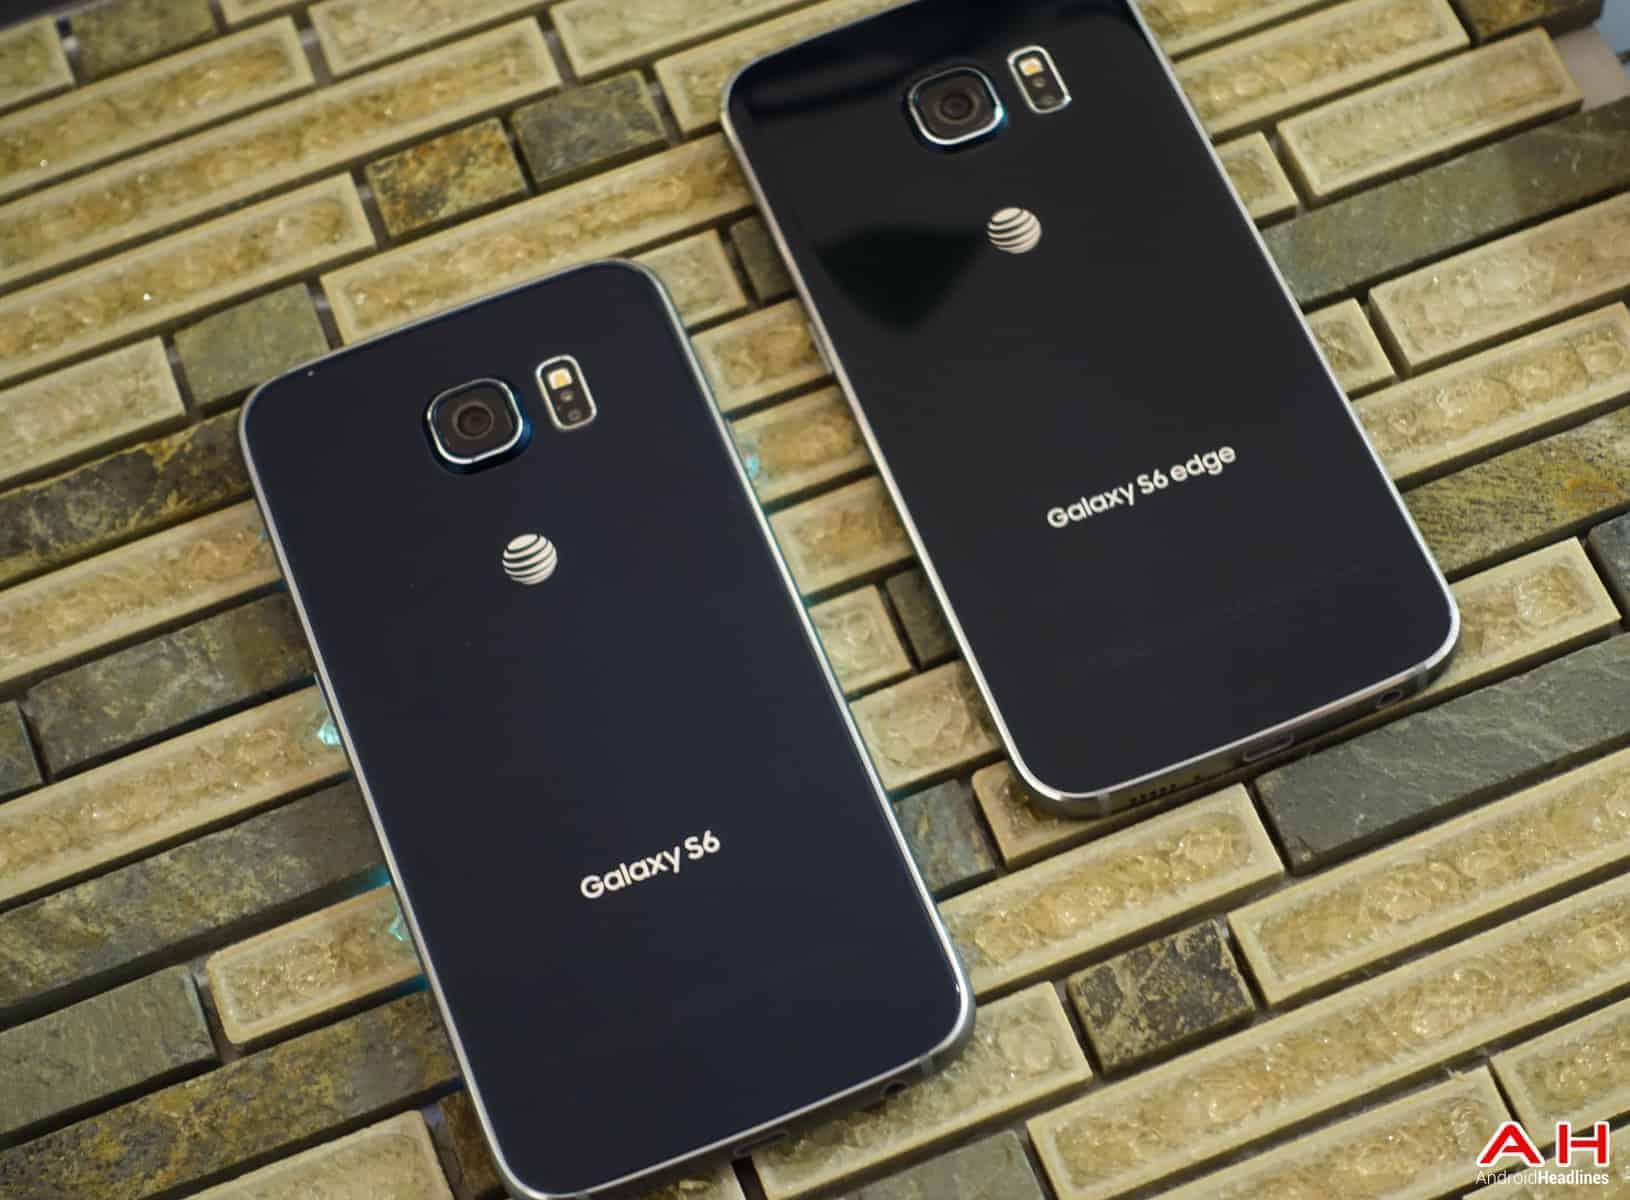 AH Samsung Galaxy S6 & Edge May 3rd - Chris-8